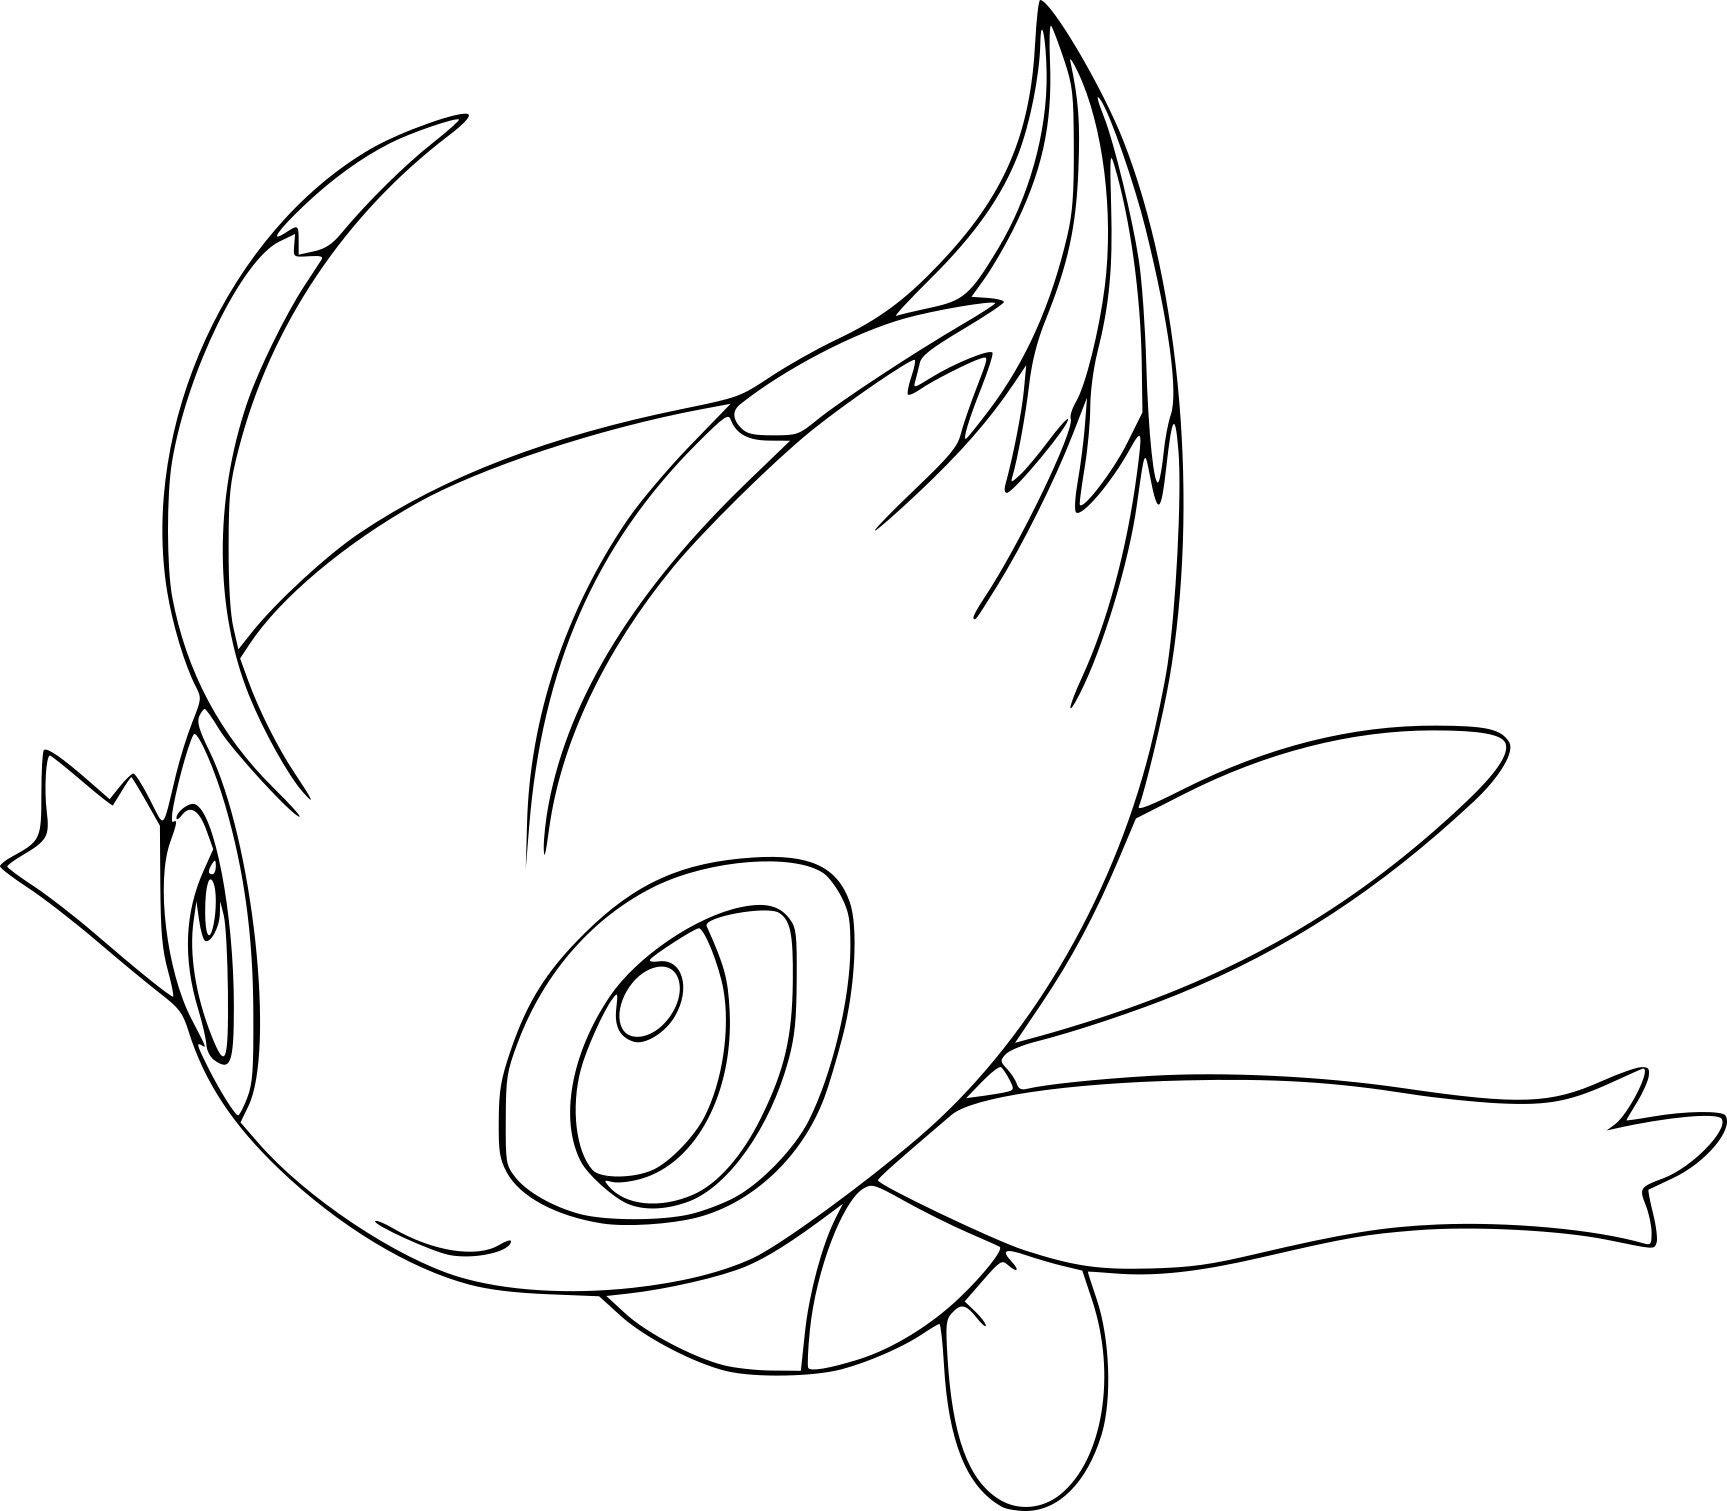 A Great Bird Pokemon Coloring Page Pokemon Coloring Pokemon Coloring Pages Witch Coloring Pages